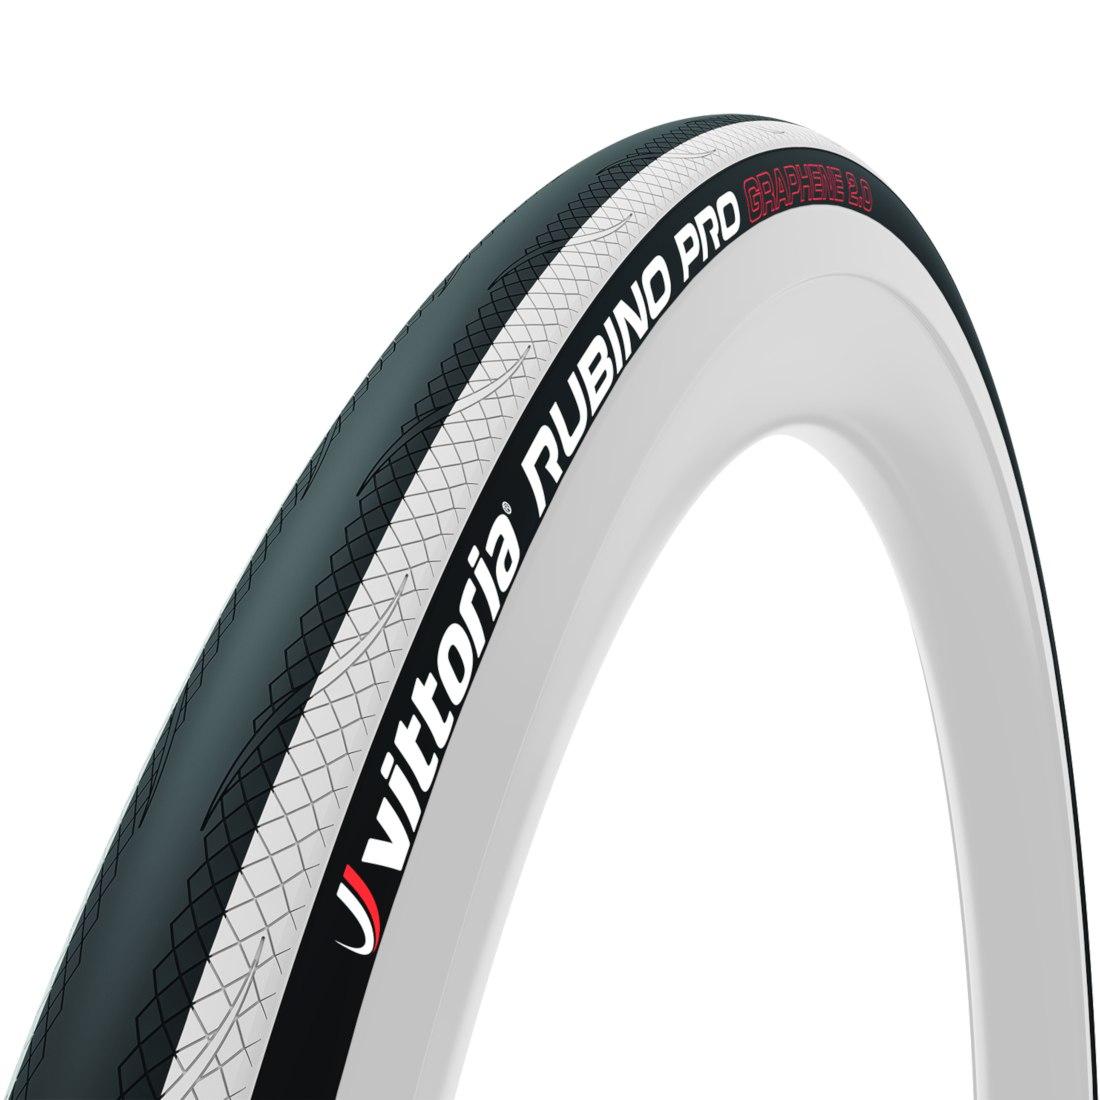 Vittoria Rubino Pro G2.0 Faltreifen - schwarz / weiß - ETRTO 25-622